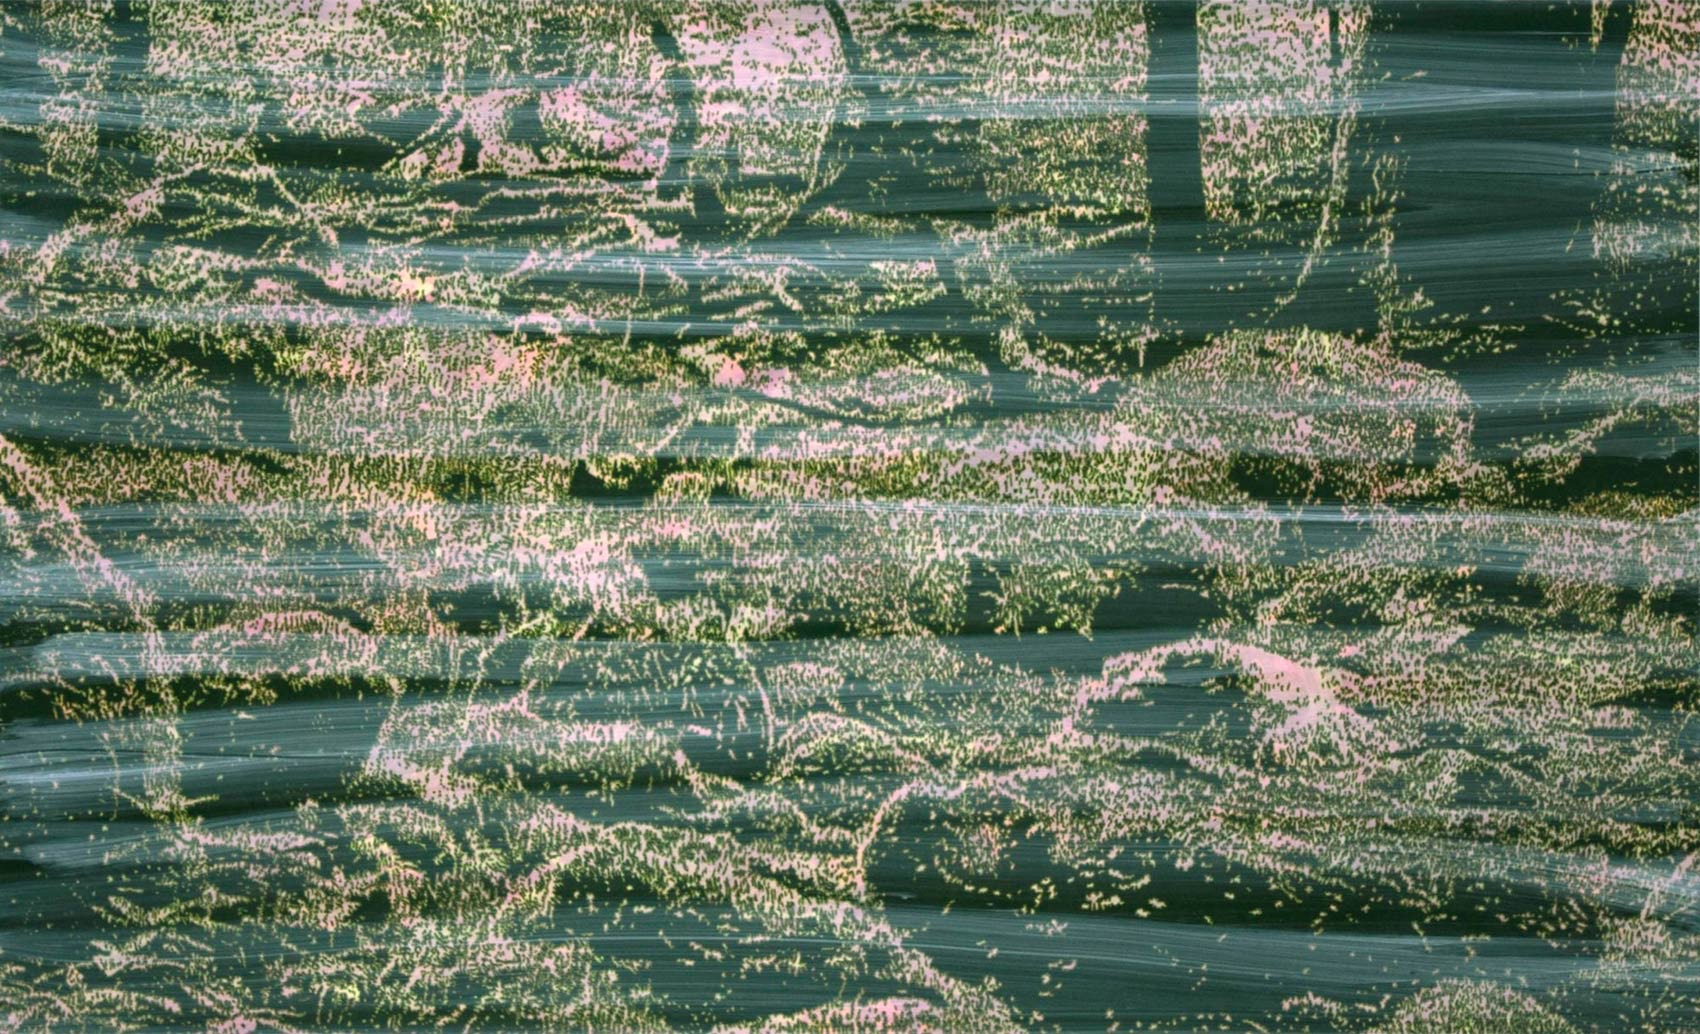 Primary Forest 9, 2014, peinture alkyde sur Dibond, 125 x 205 cm